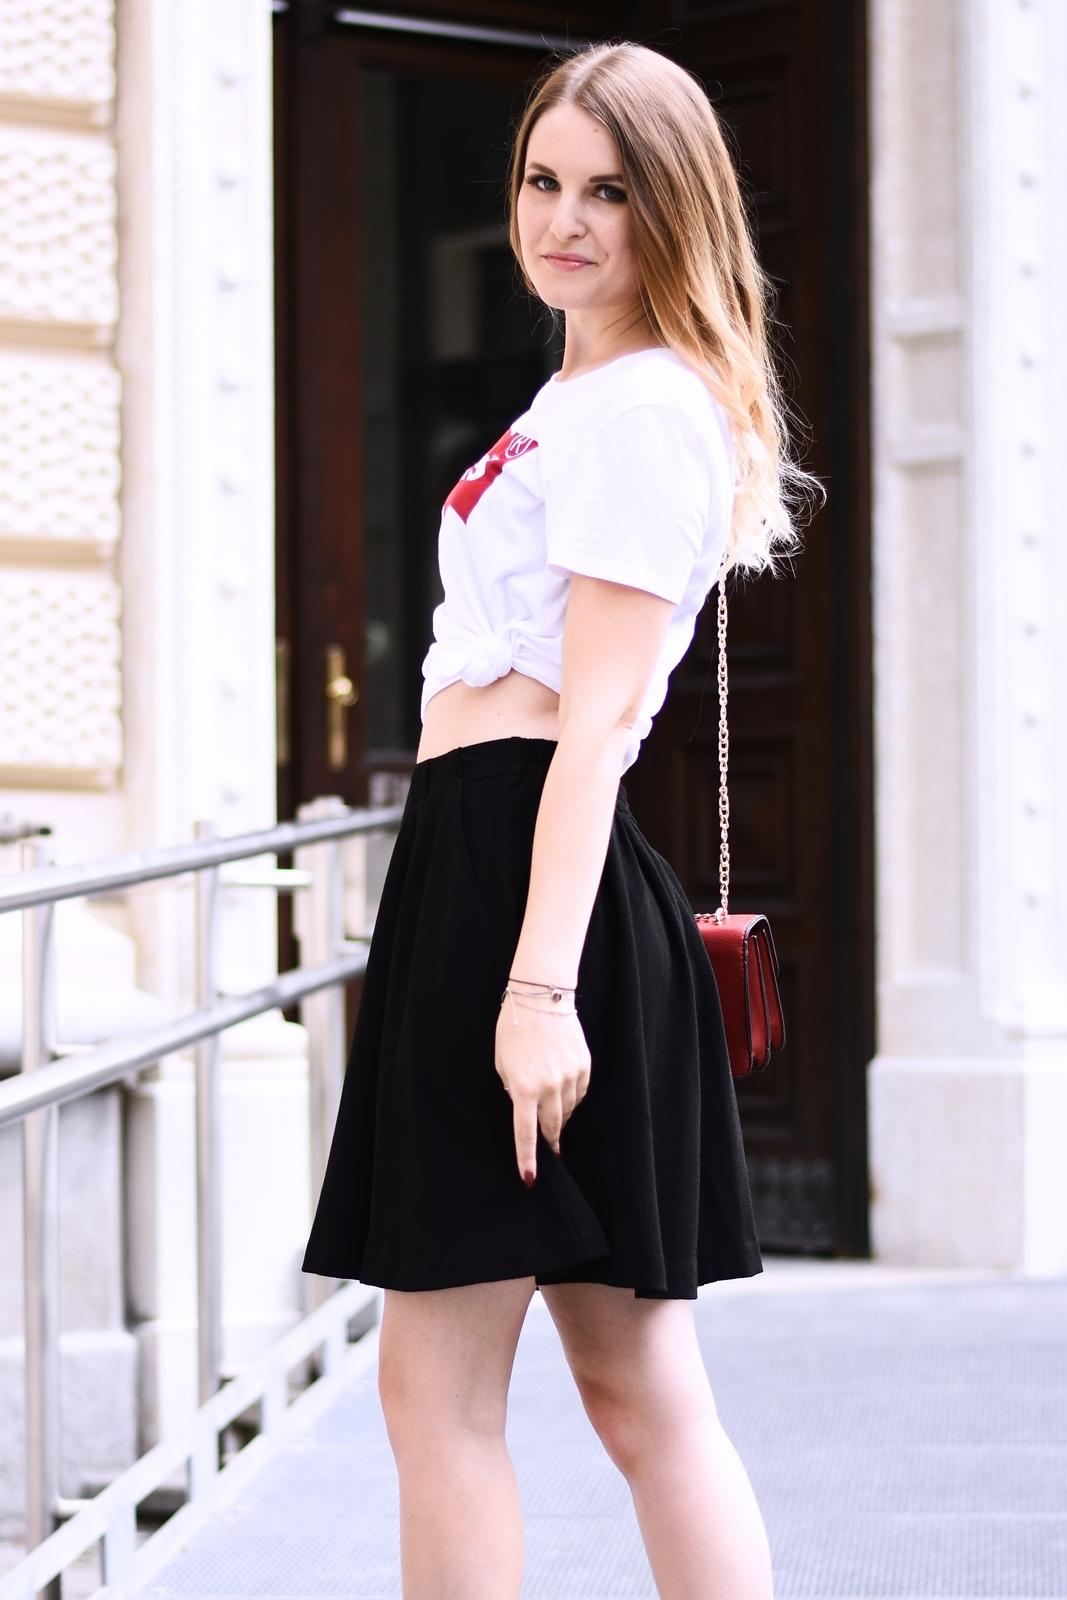 Brand Shirt kombinieren - so stylst du dieses Trend Teil - Levis - Statement - Love Bag - Basic - Rock - Converse - Fashionladyloves by Tamara Wagner Fashionblog